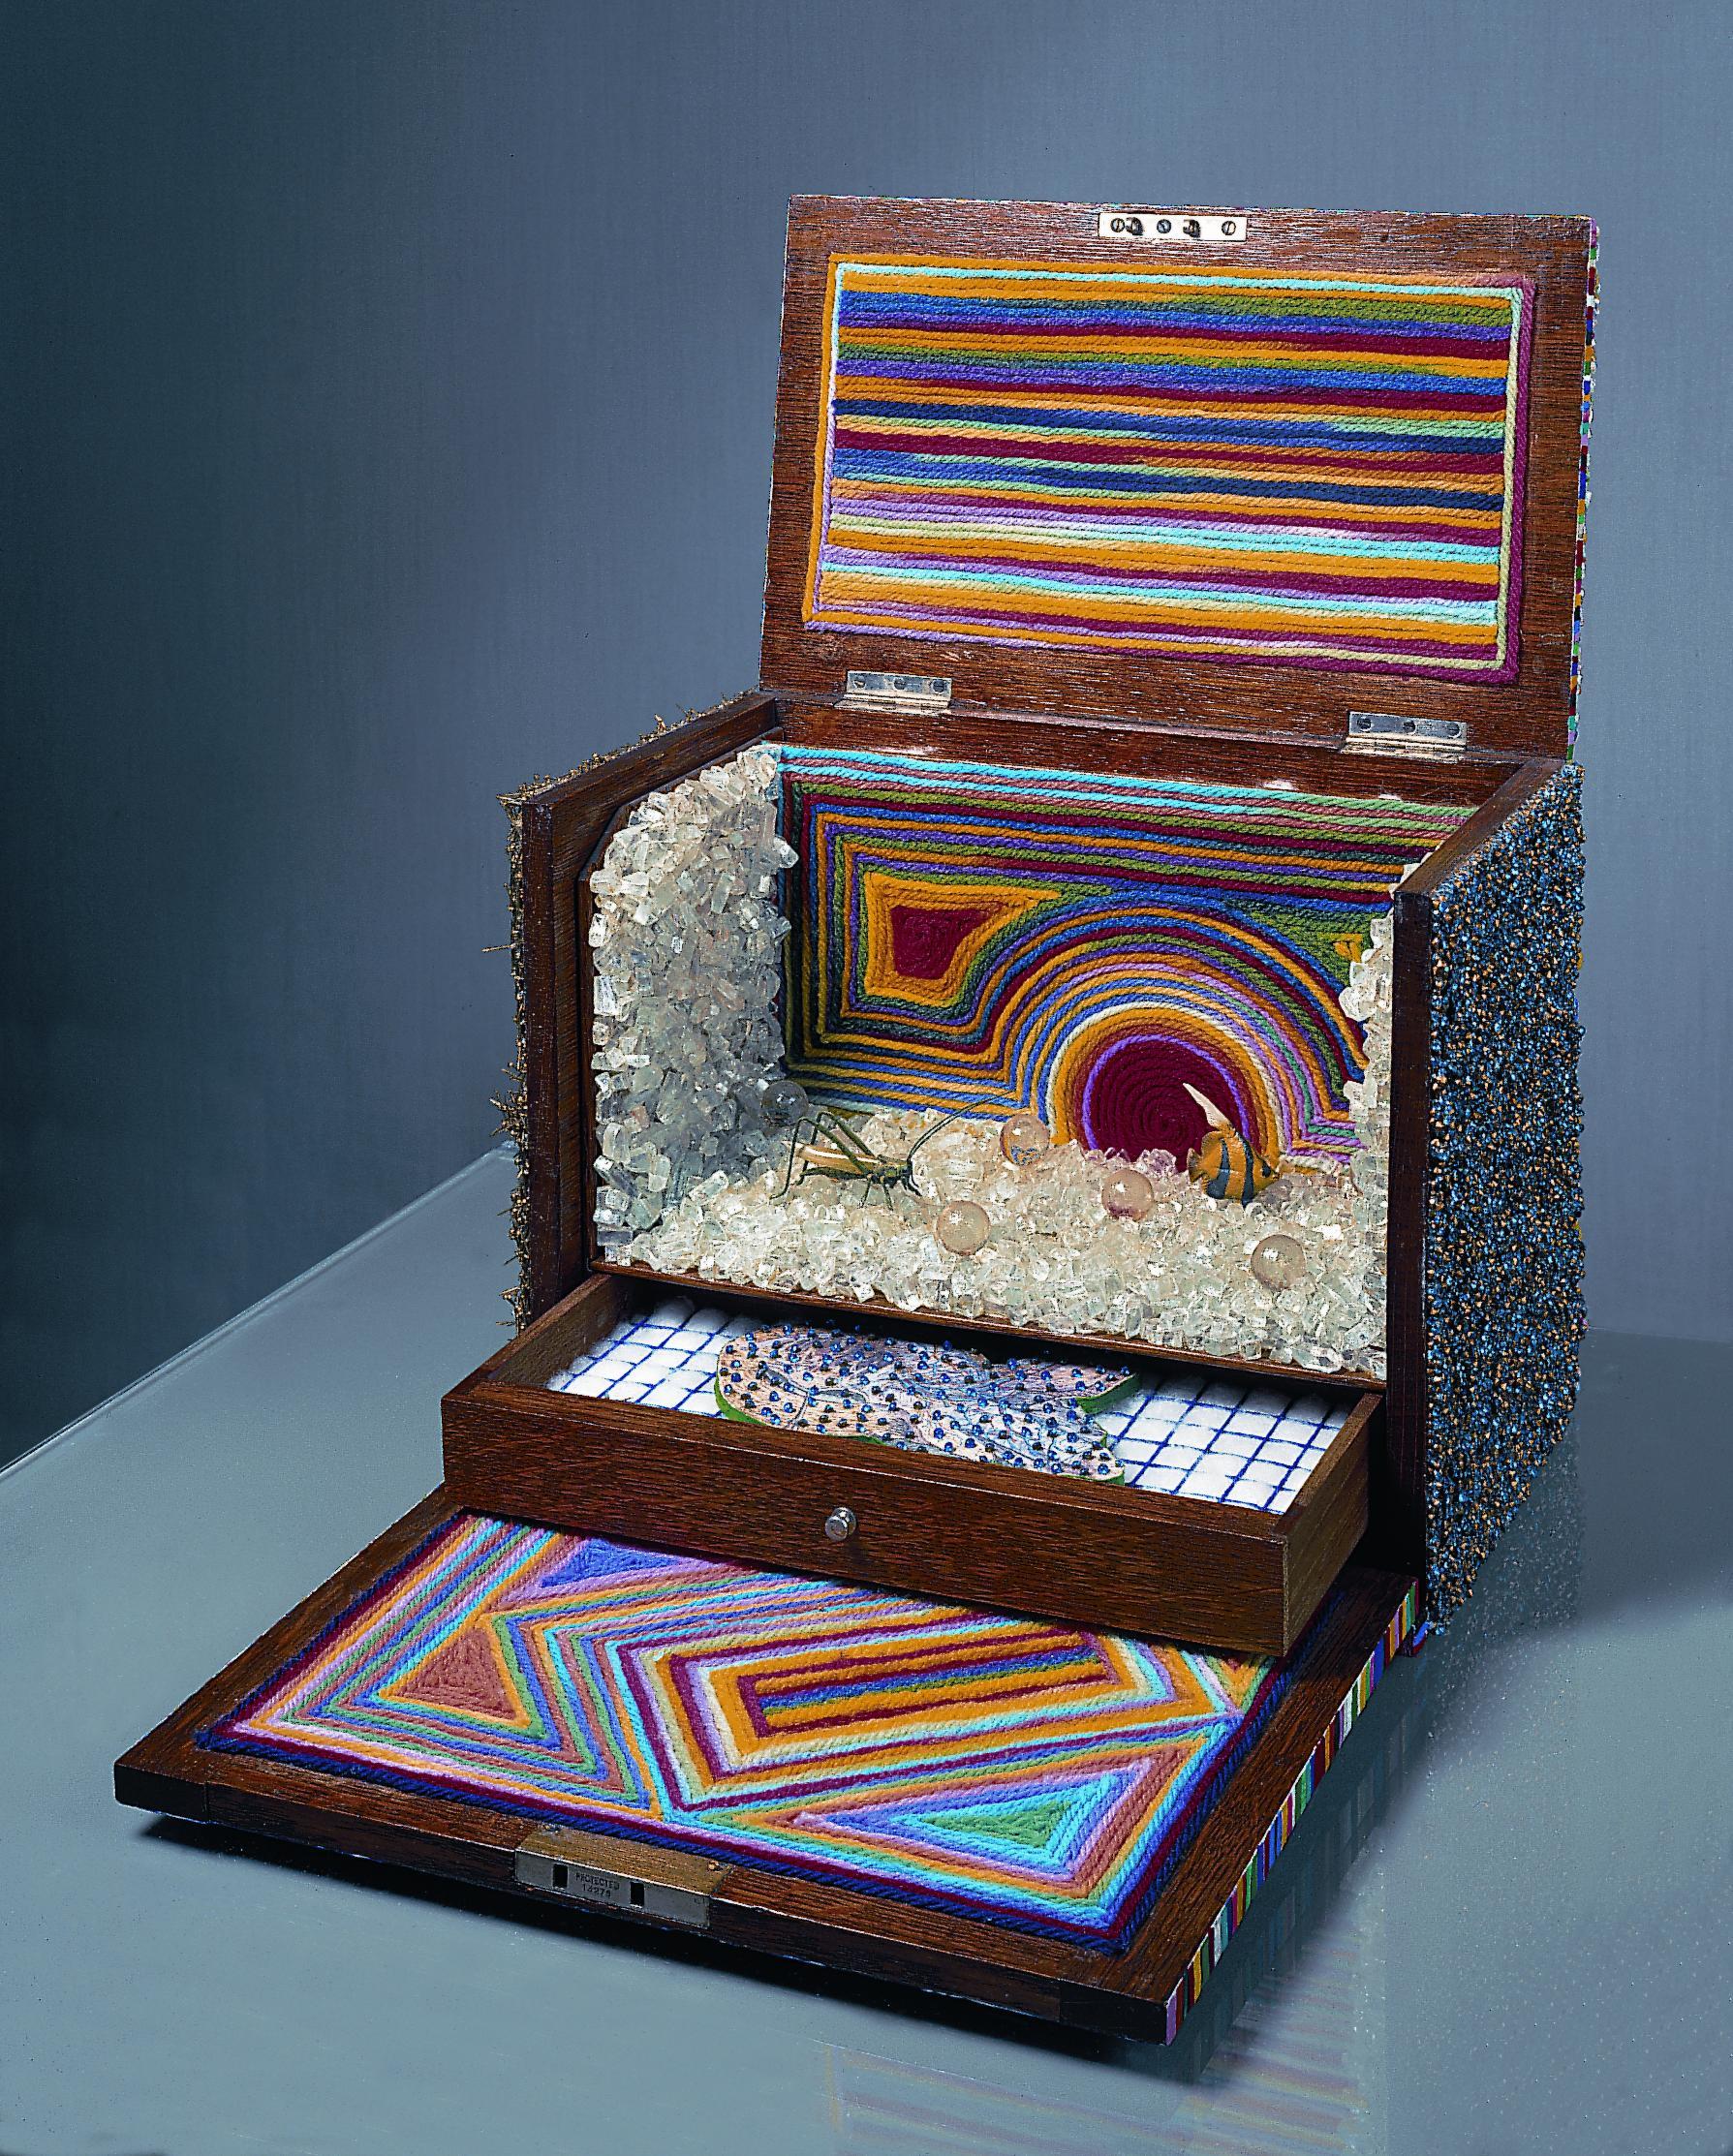 Lucas Samaras   Box #90 , 1974 Mixed media, 14 1/2 x 15 3/4 inches SOLD